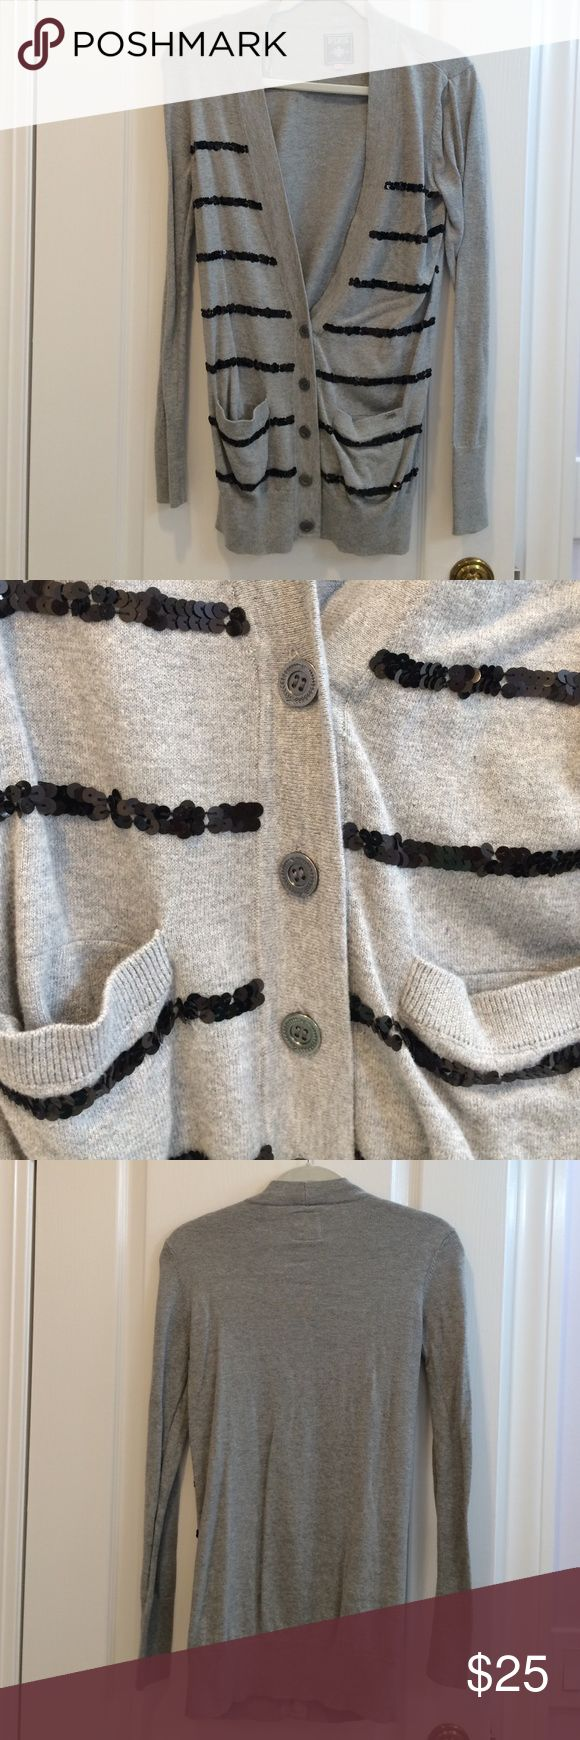 NWOT Pink VS Cardigan. Gray with black sequins. Never worn. Long v neckline. 100% cotton. Machine wash. PINK Victoria's Secret Sweaters Cardigans